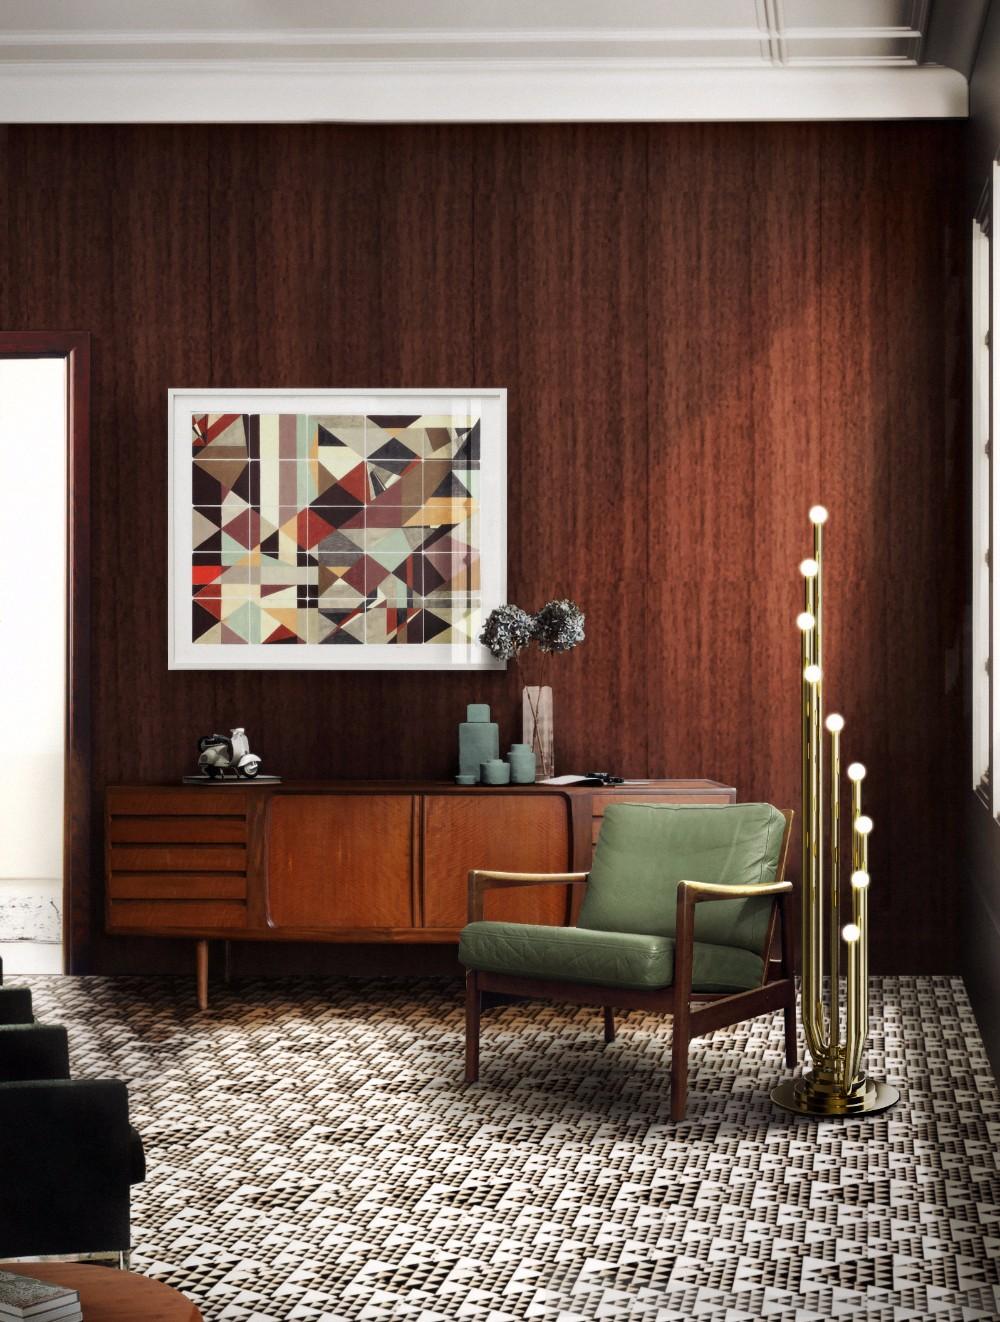 Mix match mid century furniture and brass mid century furniture mix